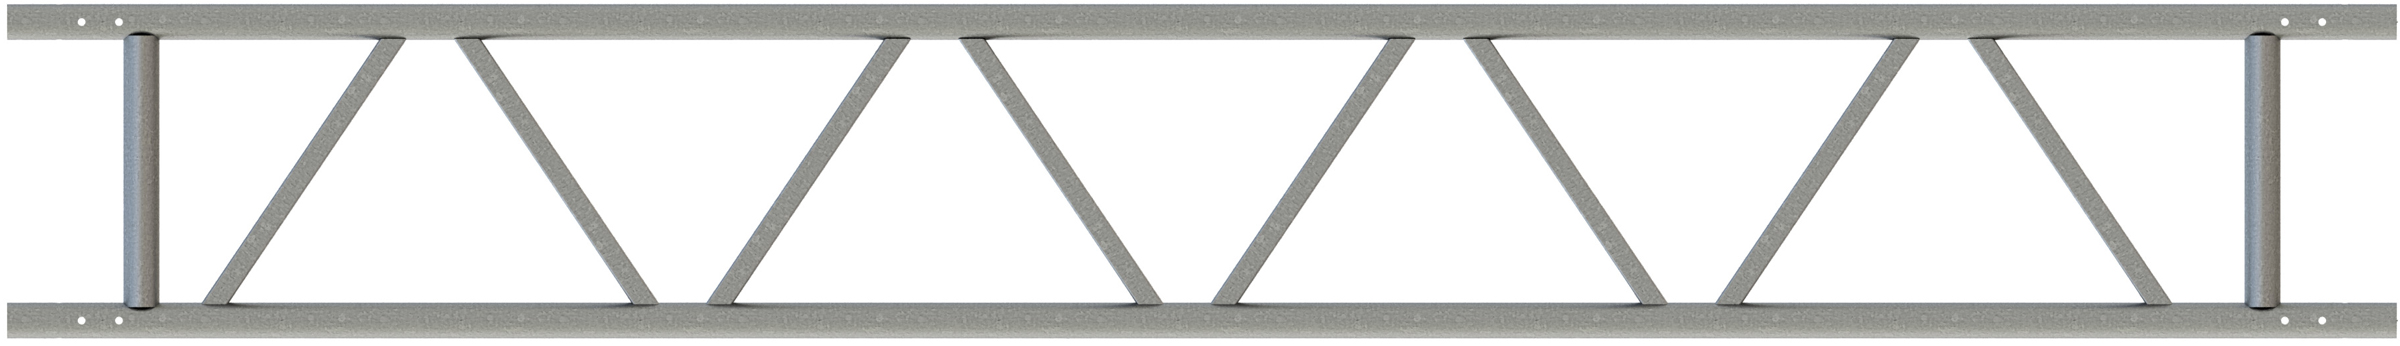 Schake Stahl-Gitterträger 450